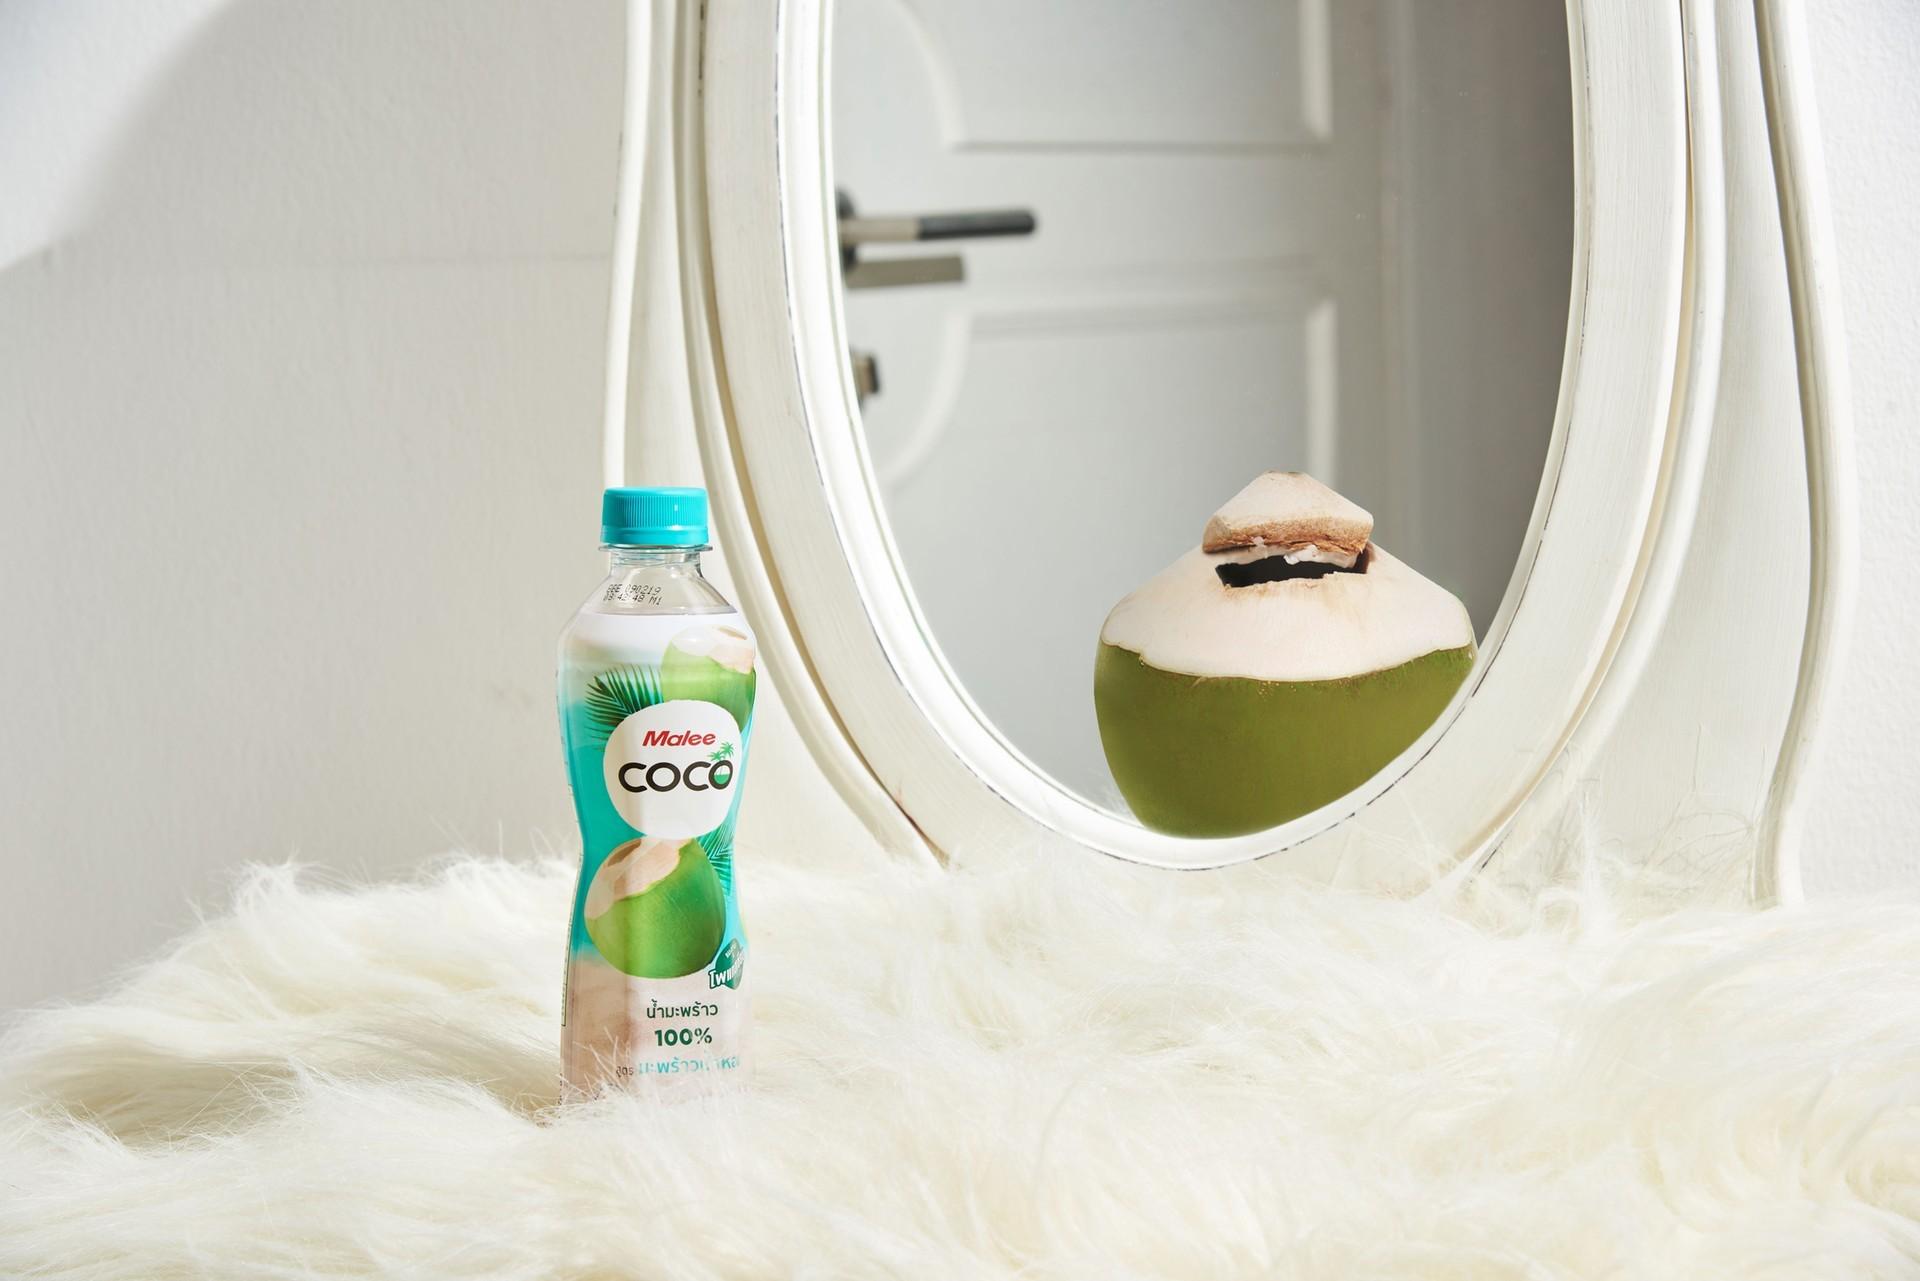 Malee coco